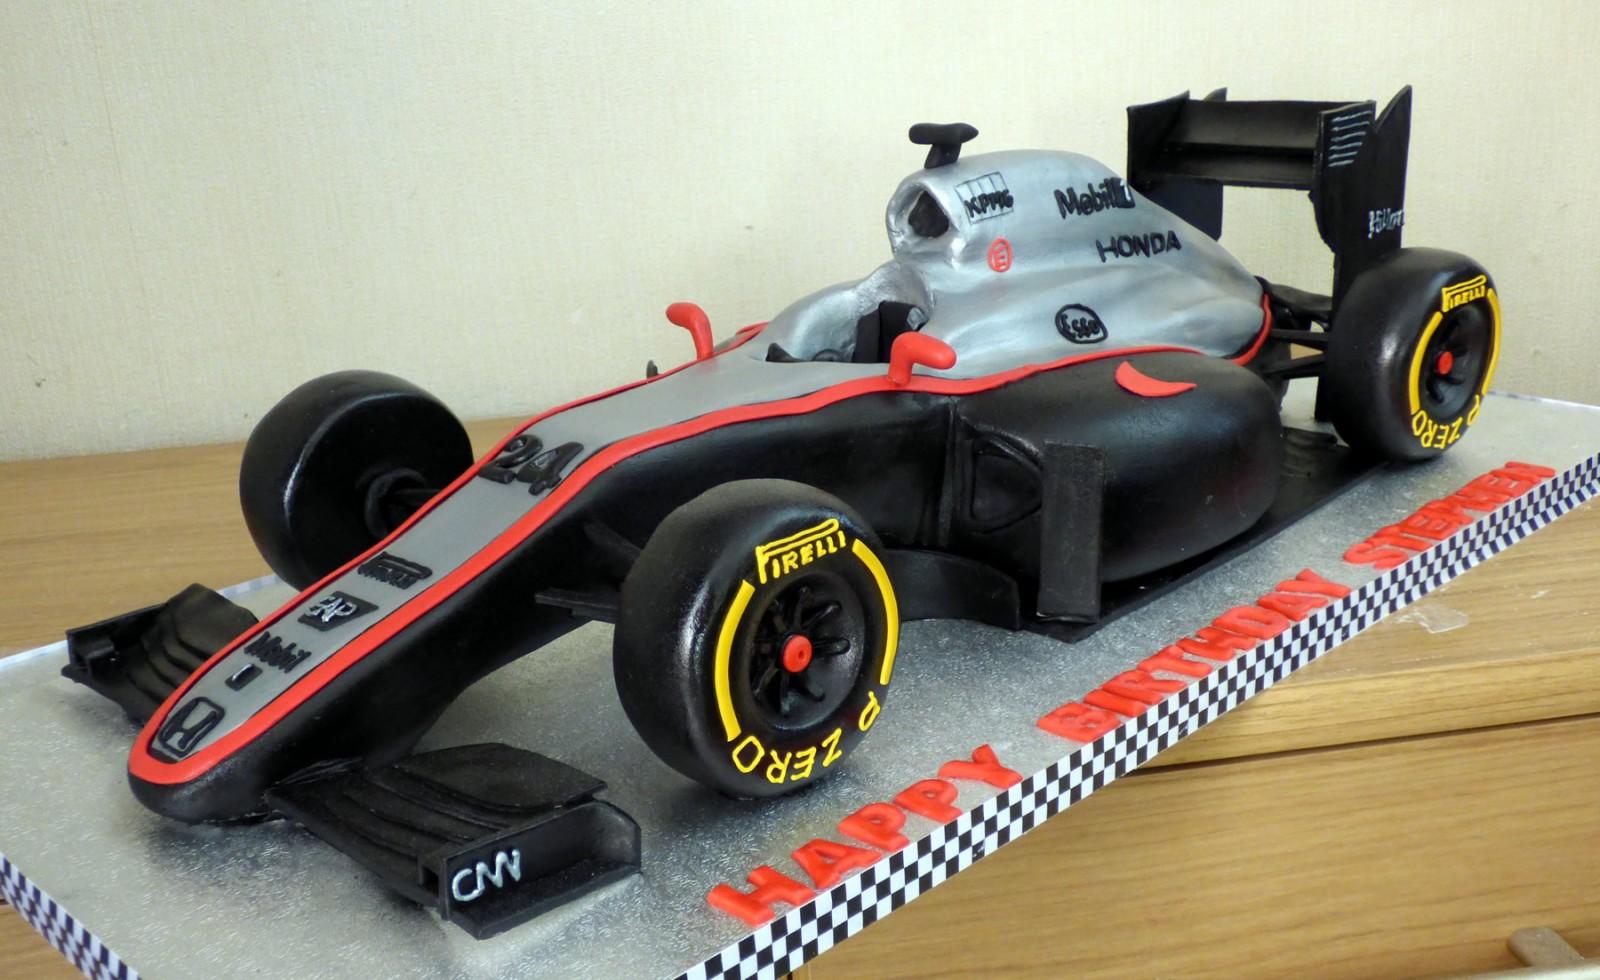 McLaren F1 2015 Race Car Birthday Cake « Susies Cakes